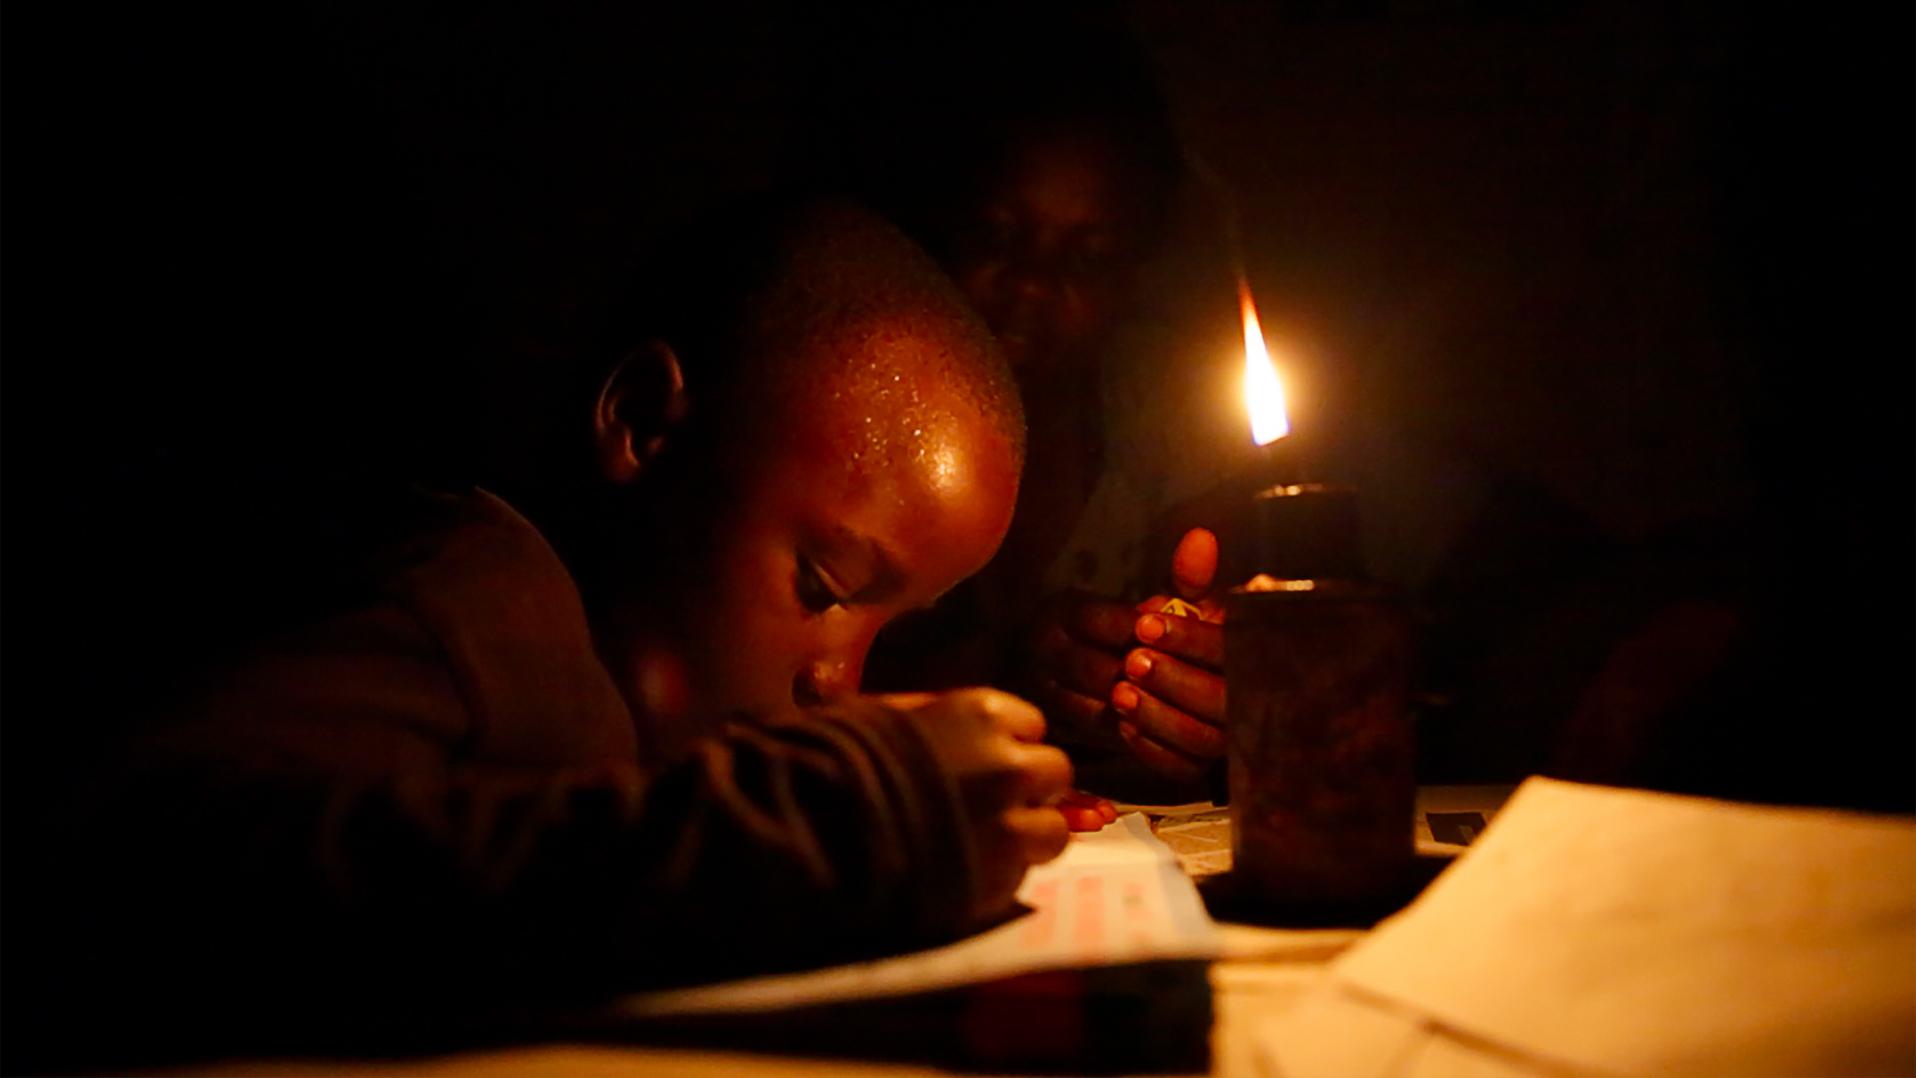 Image of a boy reading using the light of a kerosene lamp.